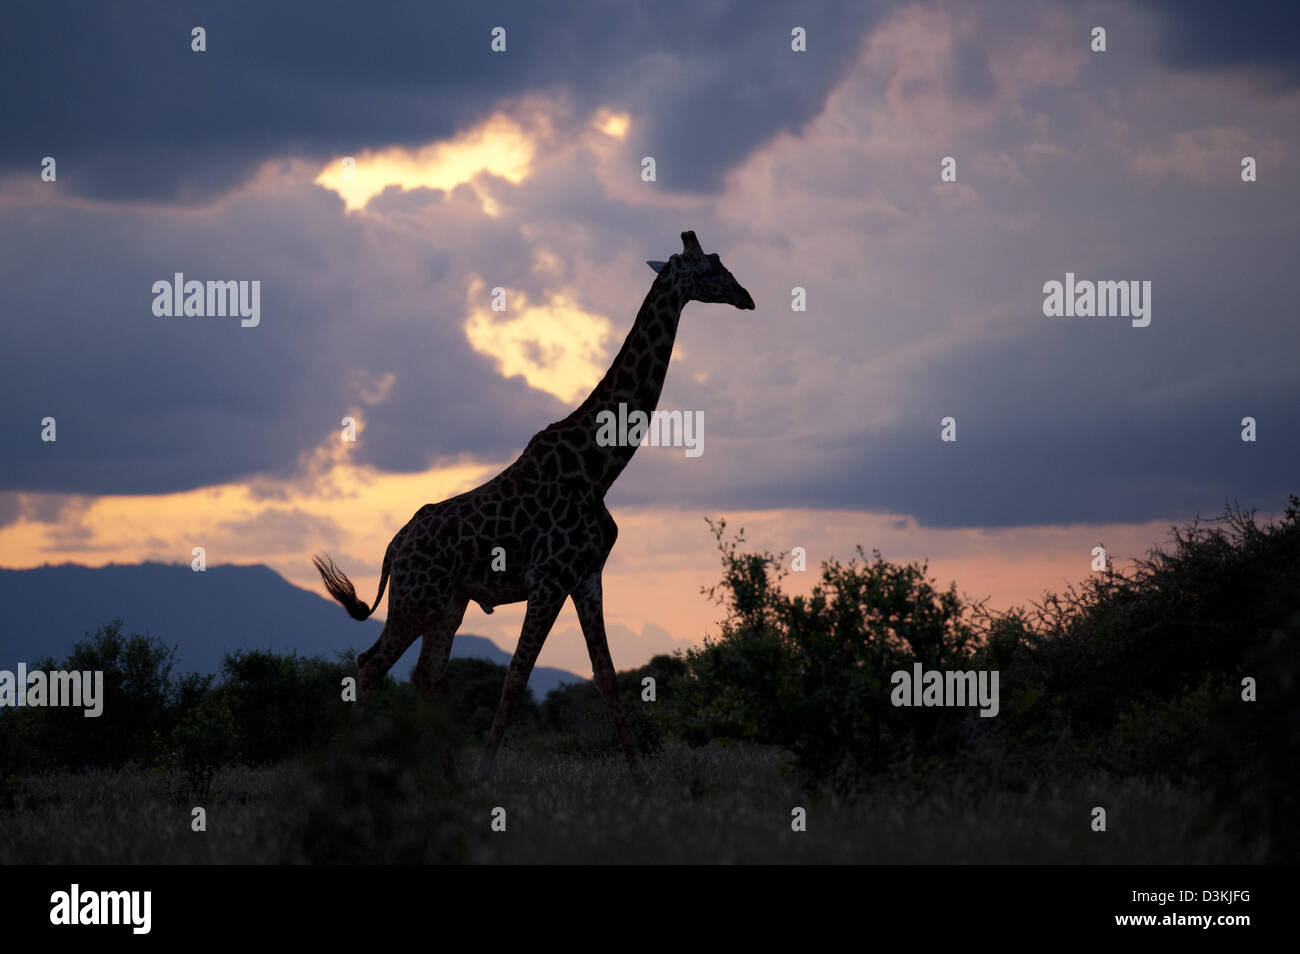 Maasai giraffe (Giraffa camelopardalis tippelskirchi) at sunset, Tsavo East National Park, Kenya - Stock Image